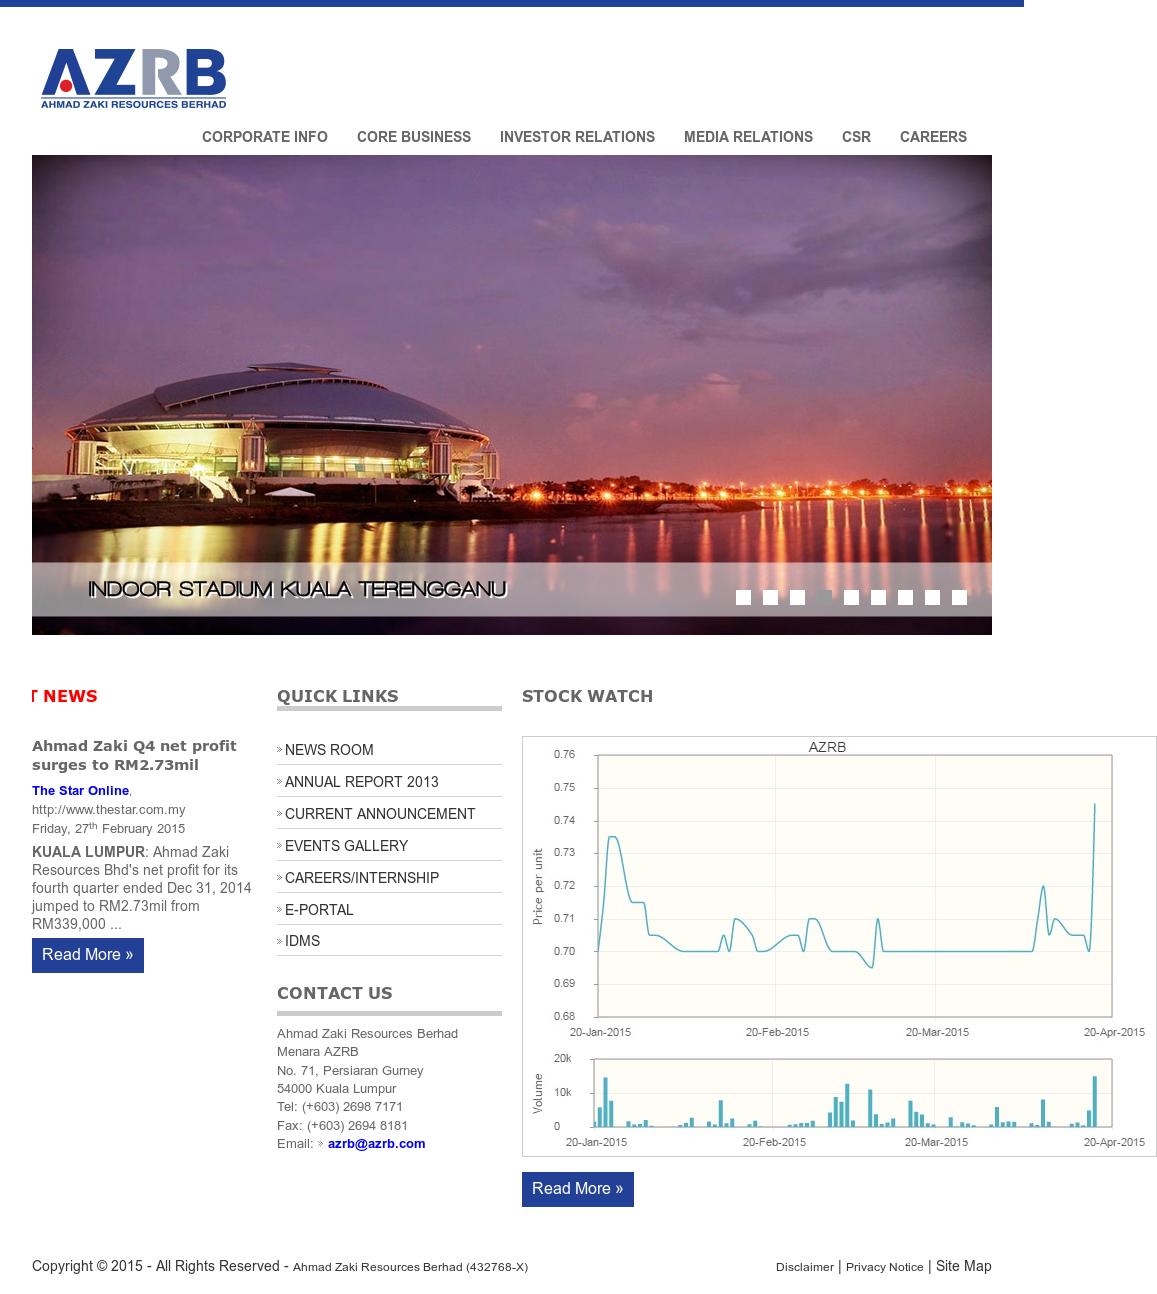 Ahmad Zaki Resources Berhad Competitors, Revenue and Employees